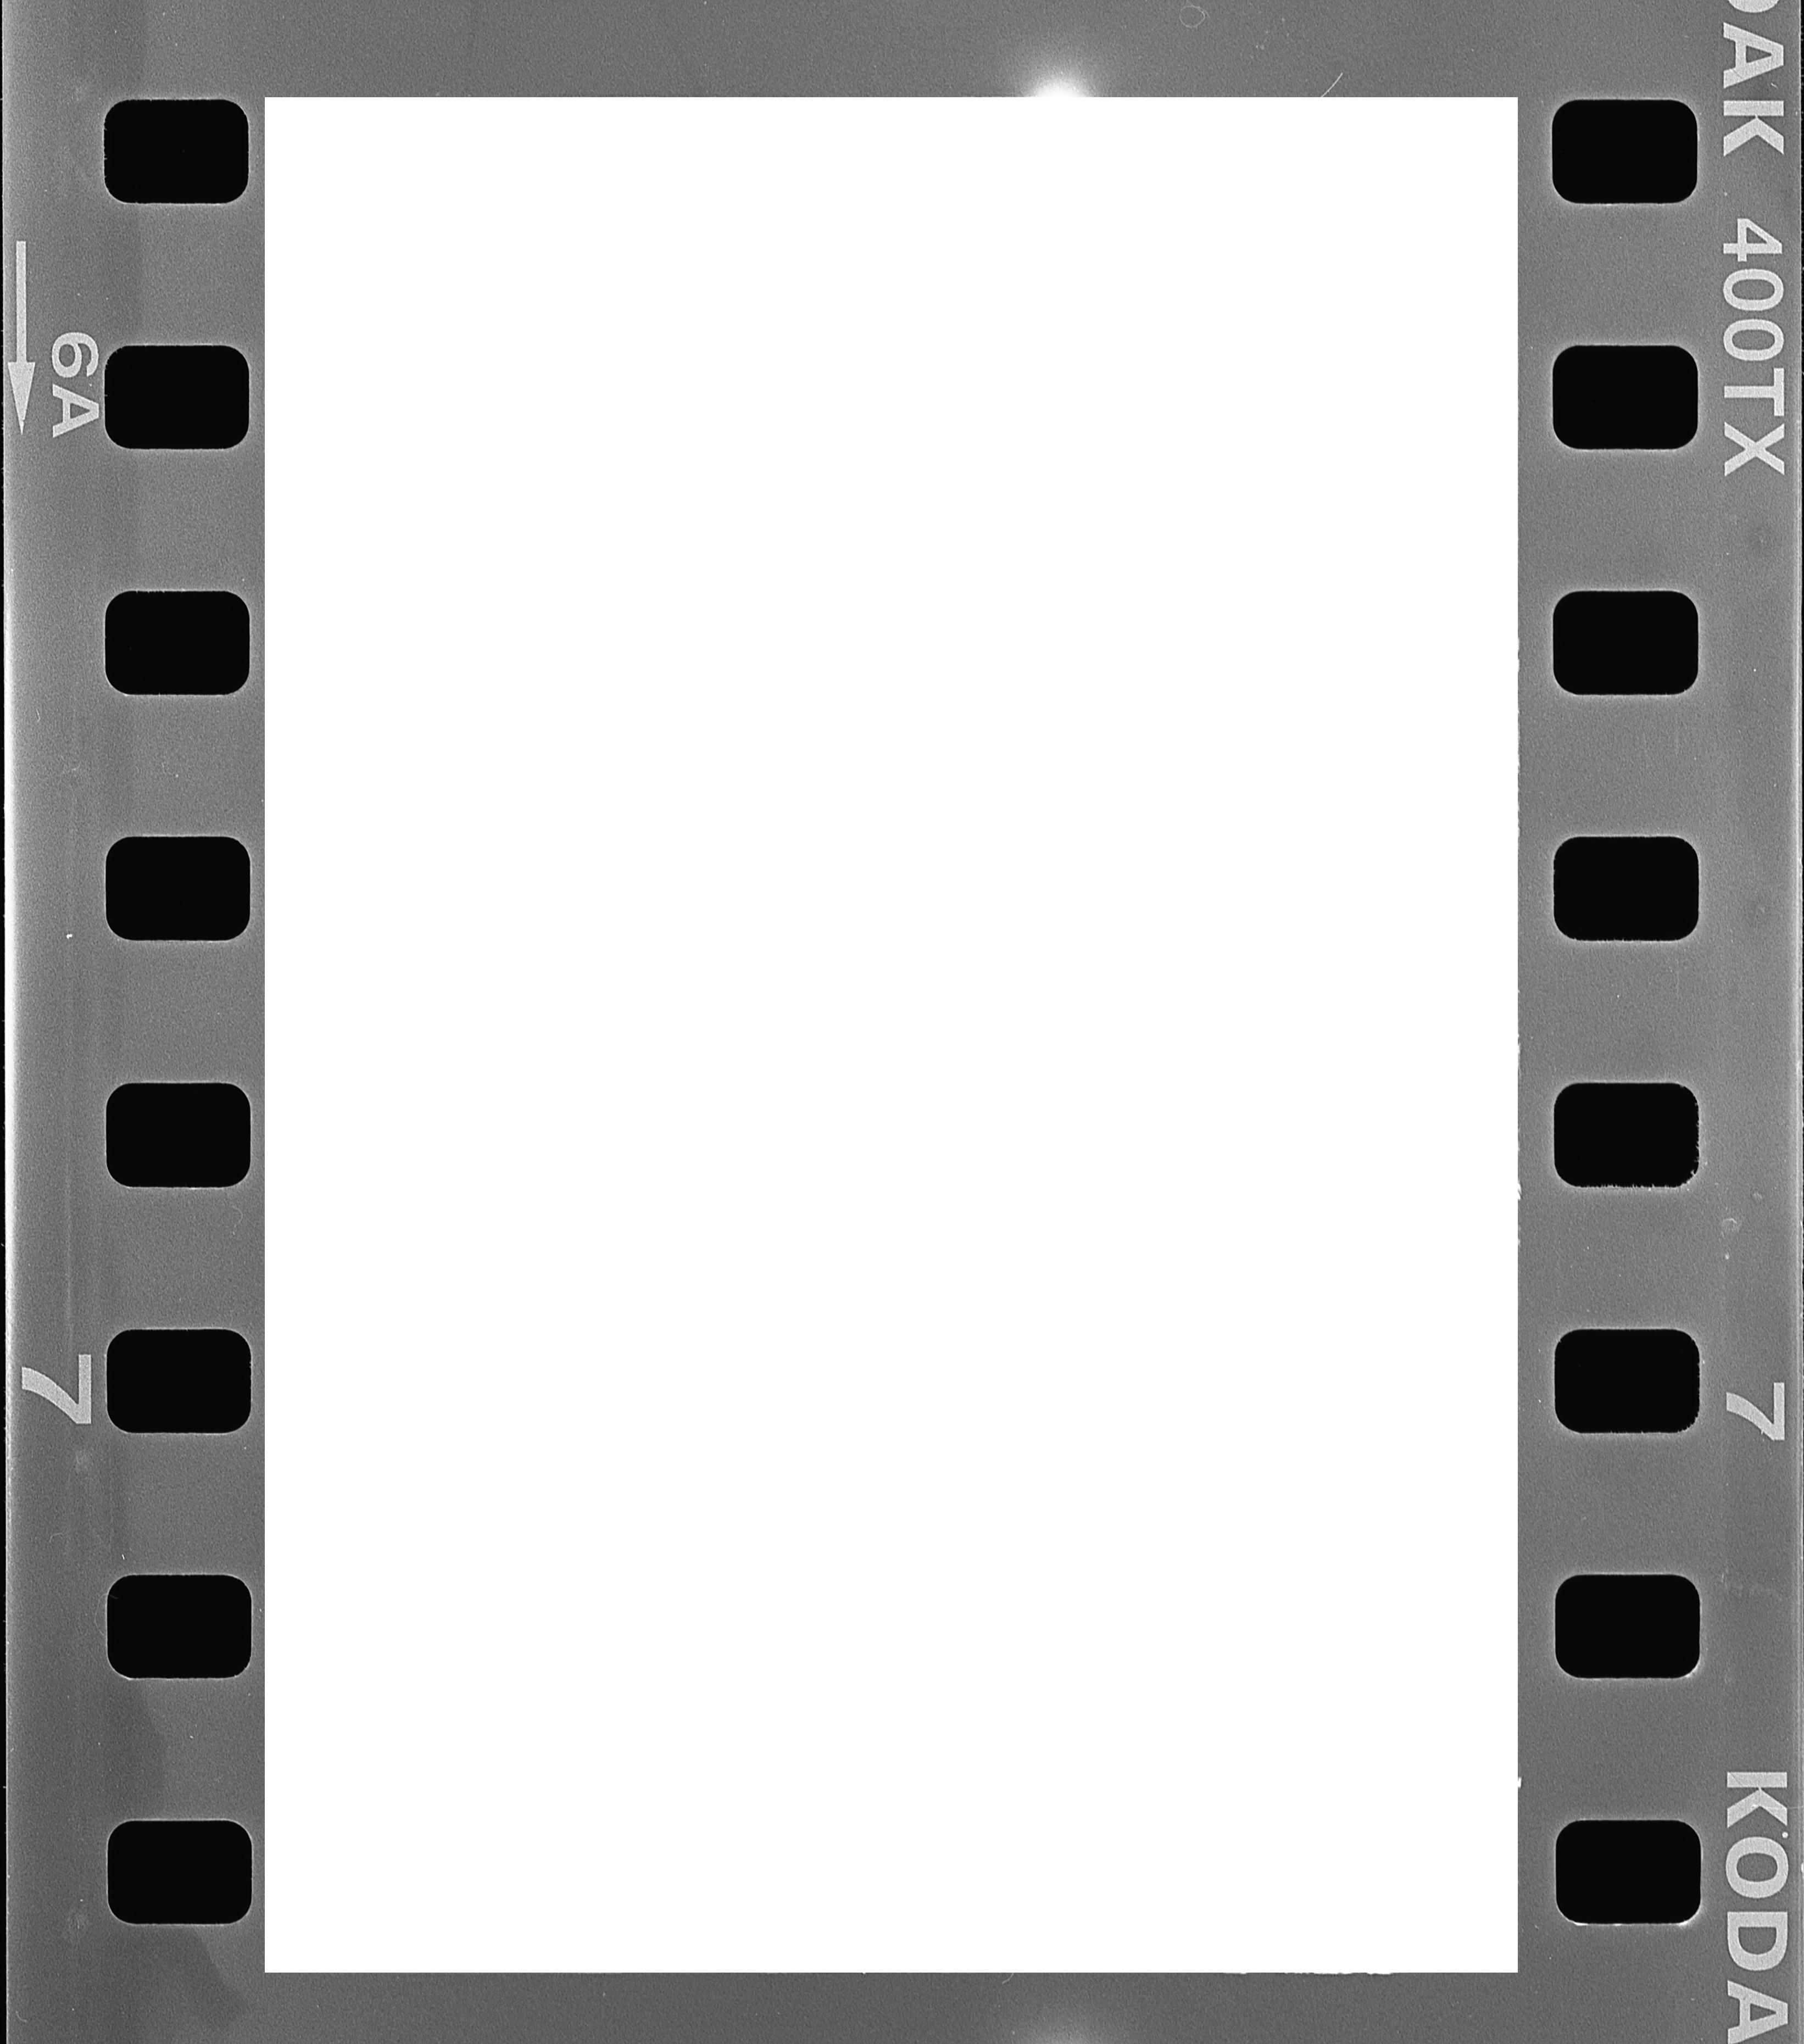 Kodak Tri X Film Border Graphic Design Overlays Border